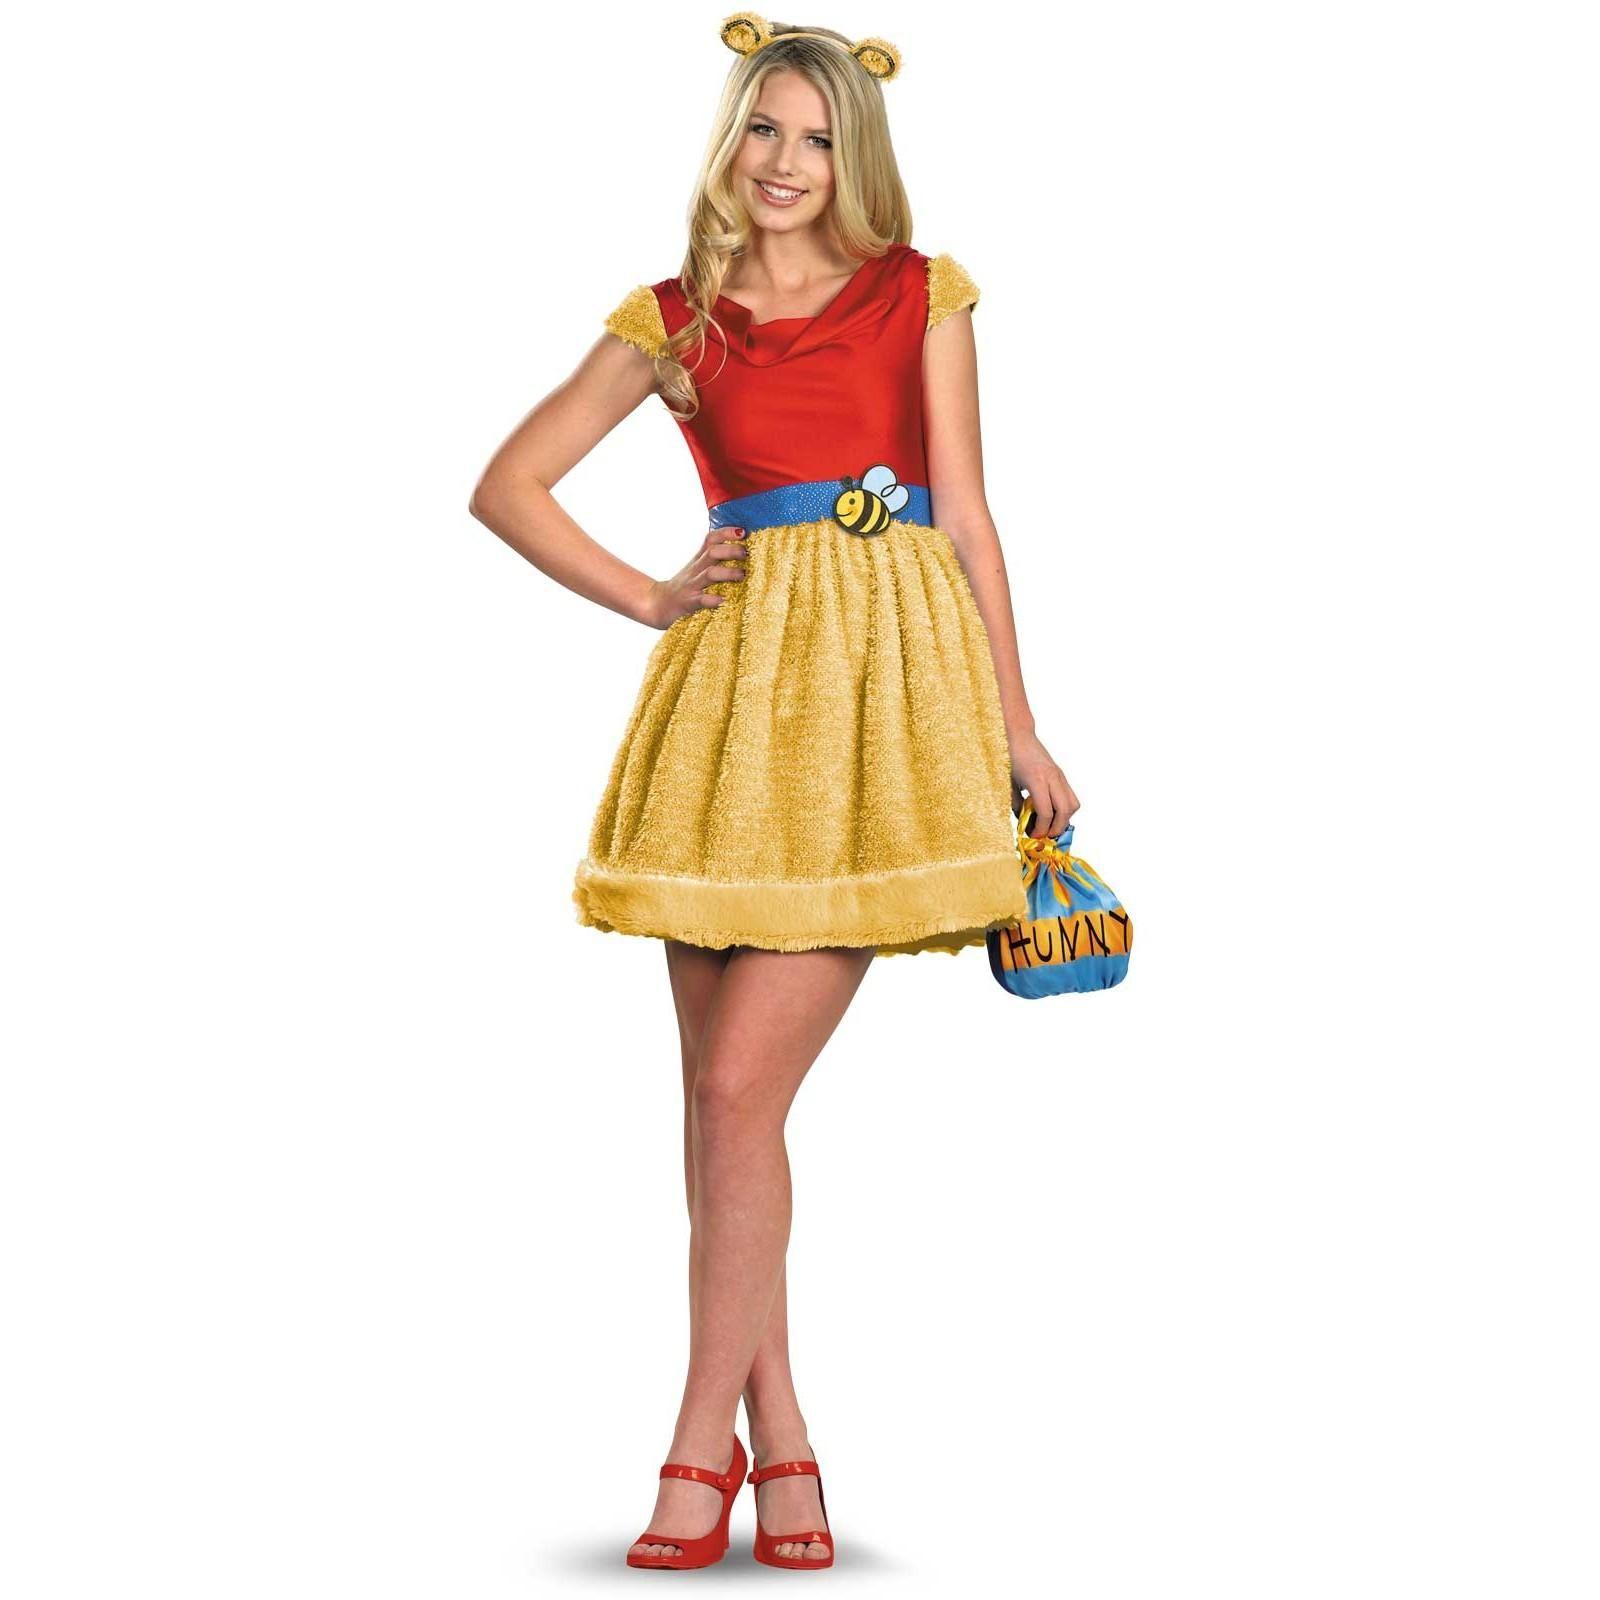 winnie the pooh diy costumes for teen girls google. Black Bedroom Furniture Sets. Home Design Ideas